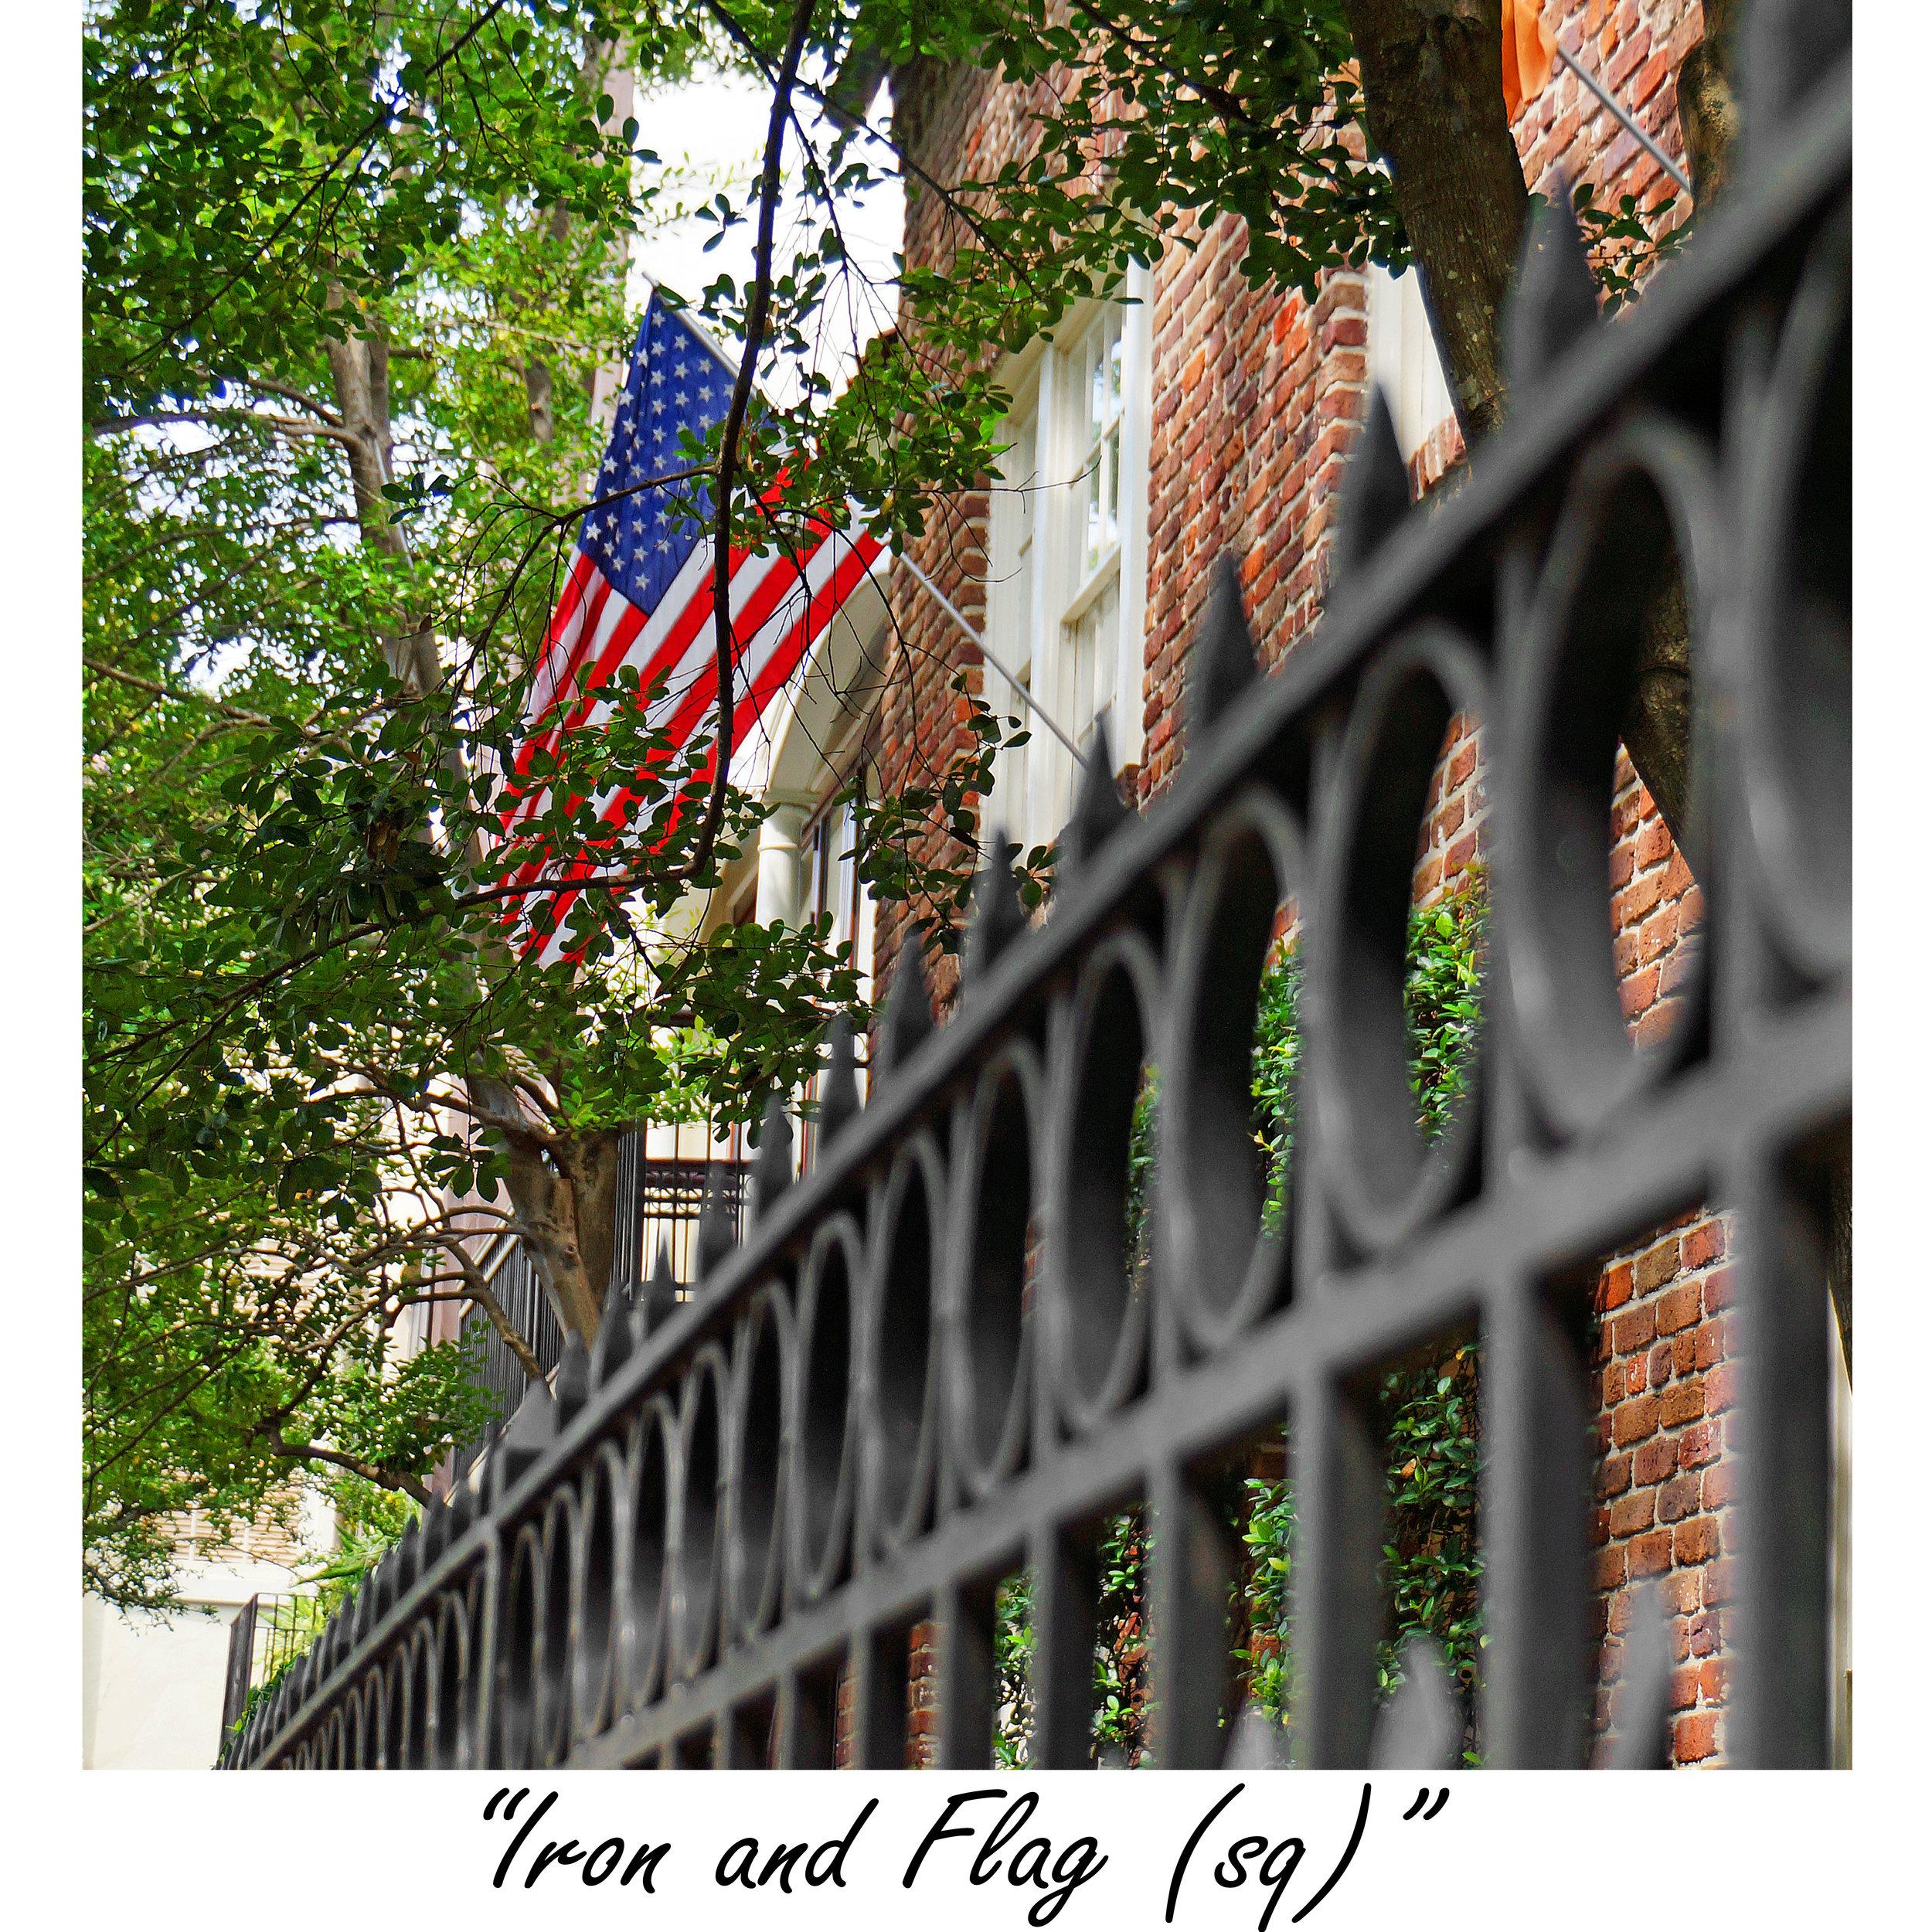 Iron and Flag (sq).jpg